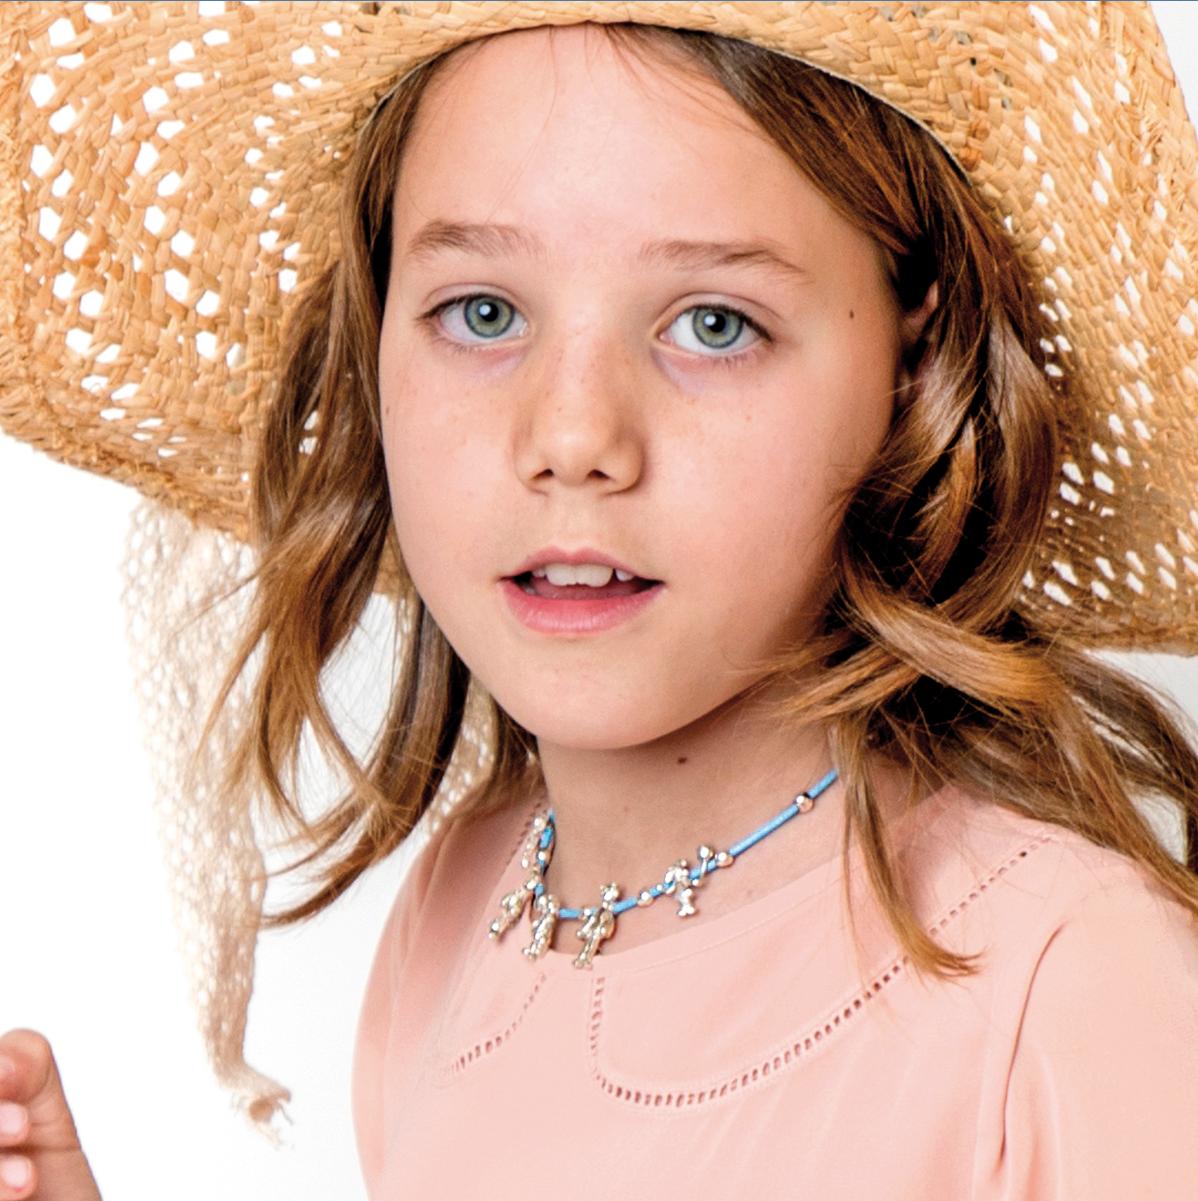 Bea Collar Small Family Classic azul